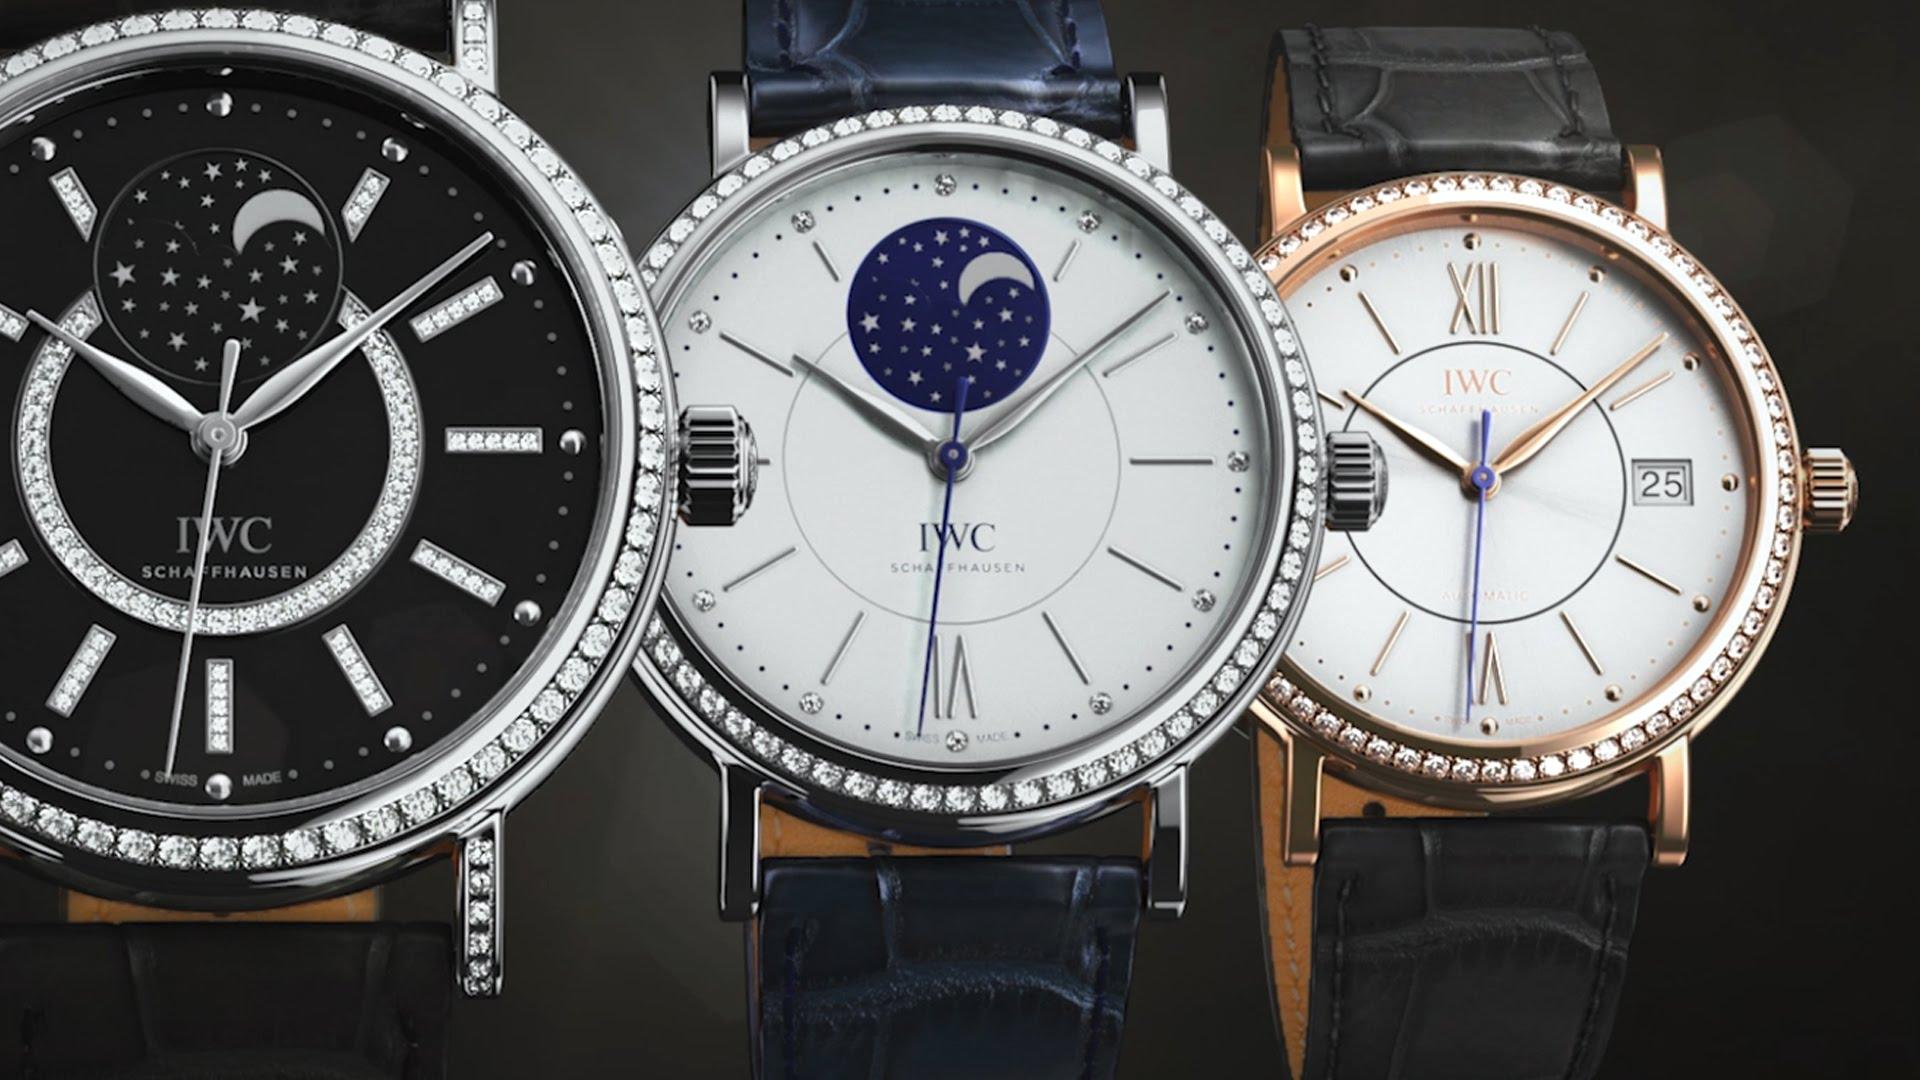 4a12800e9c1 Una mirada a la marca de relojes de lujo IWC - Catawiki